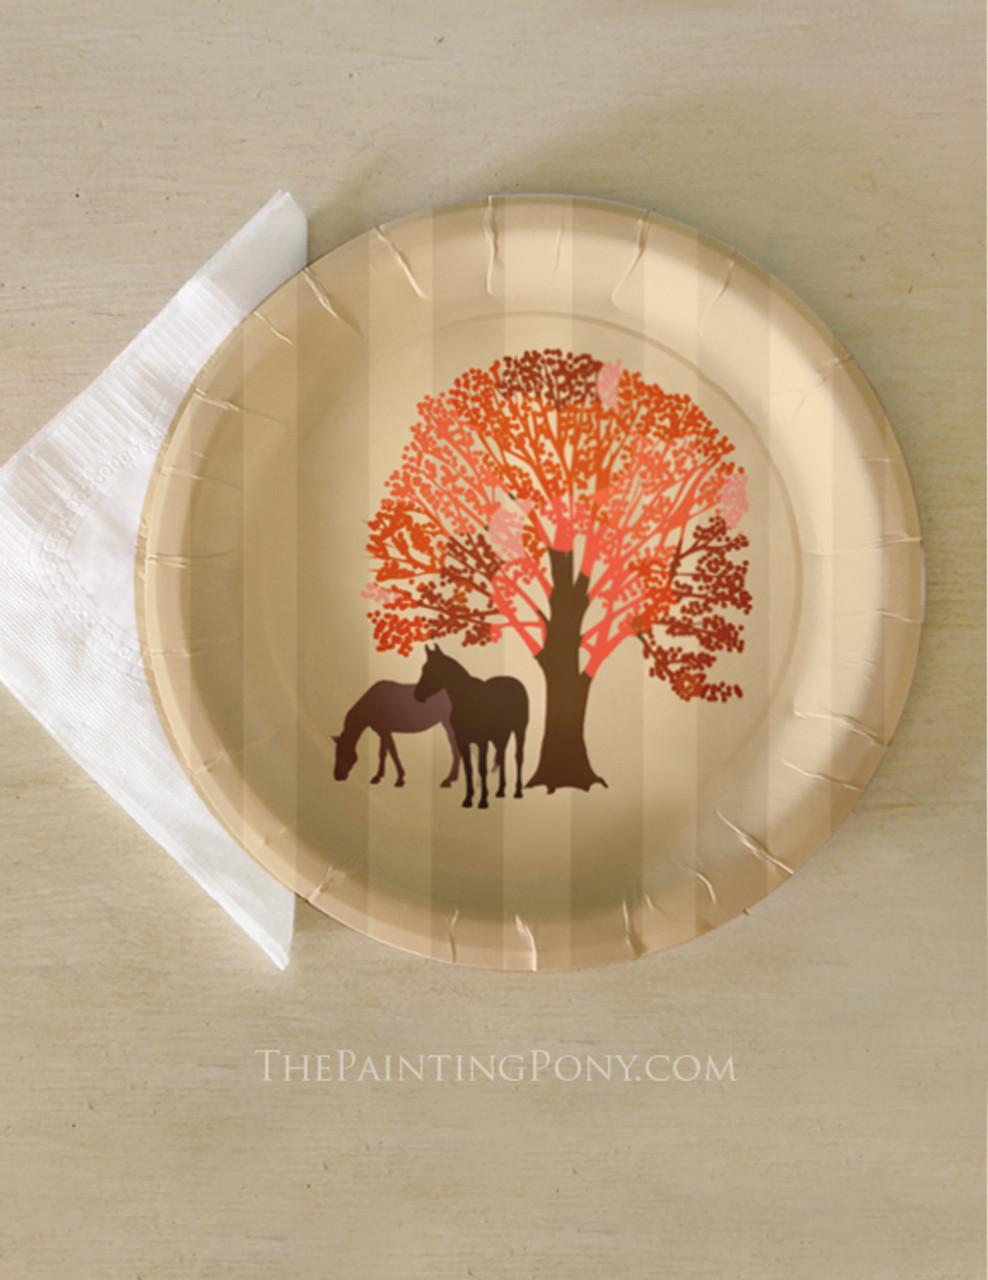 Autumn Equestrian Thanksgiving Horse Themed Paper Party Plates (8 pk) & Autumn Equestrian Thanksgiving Horse Themed Paper Party Plates (8 pk ...